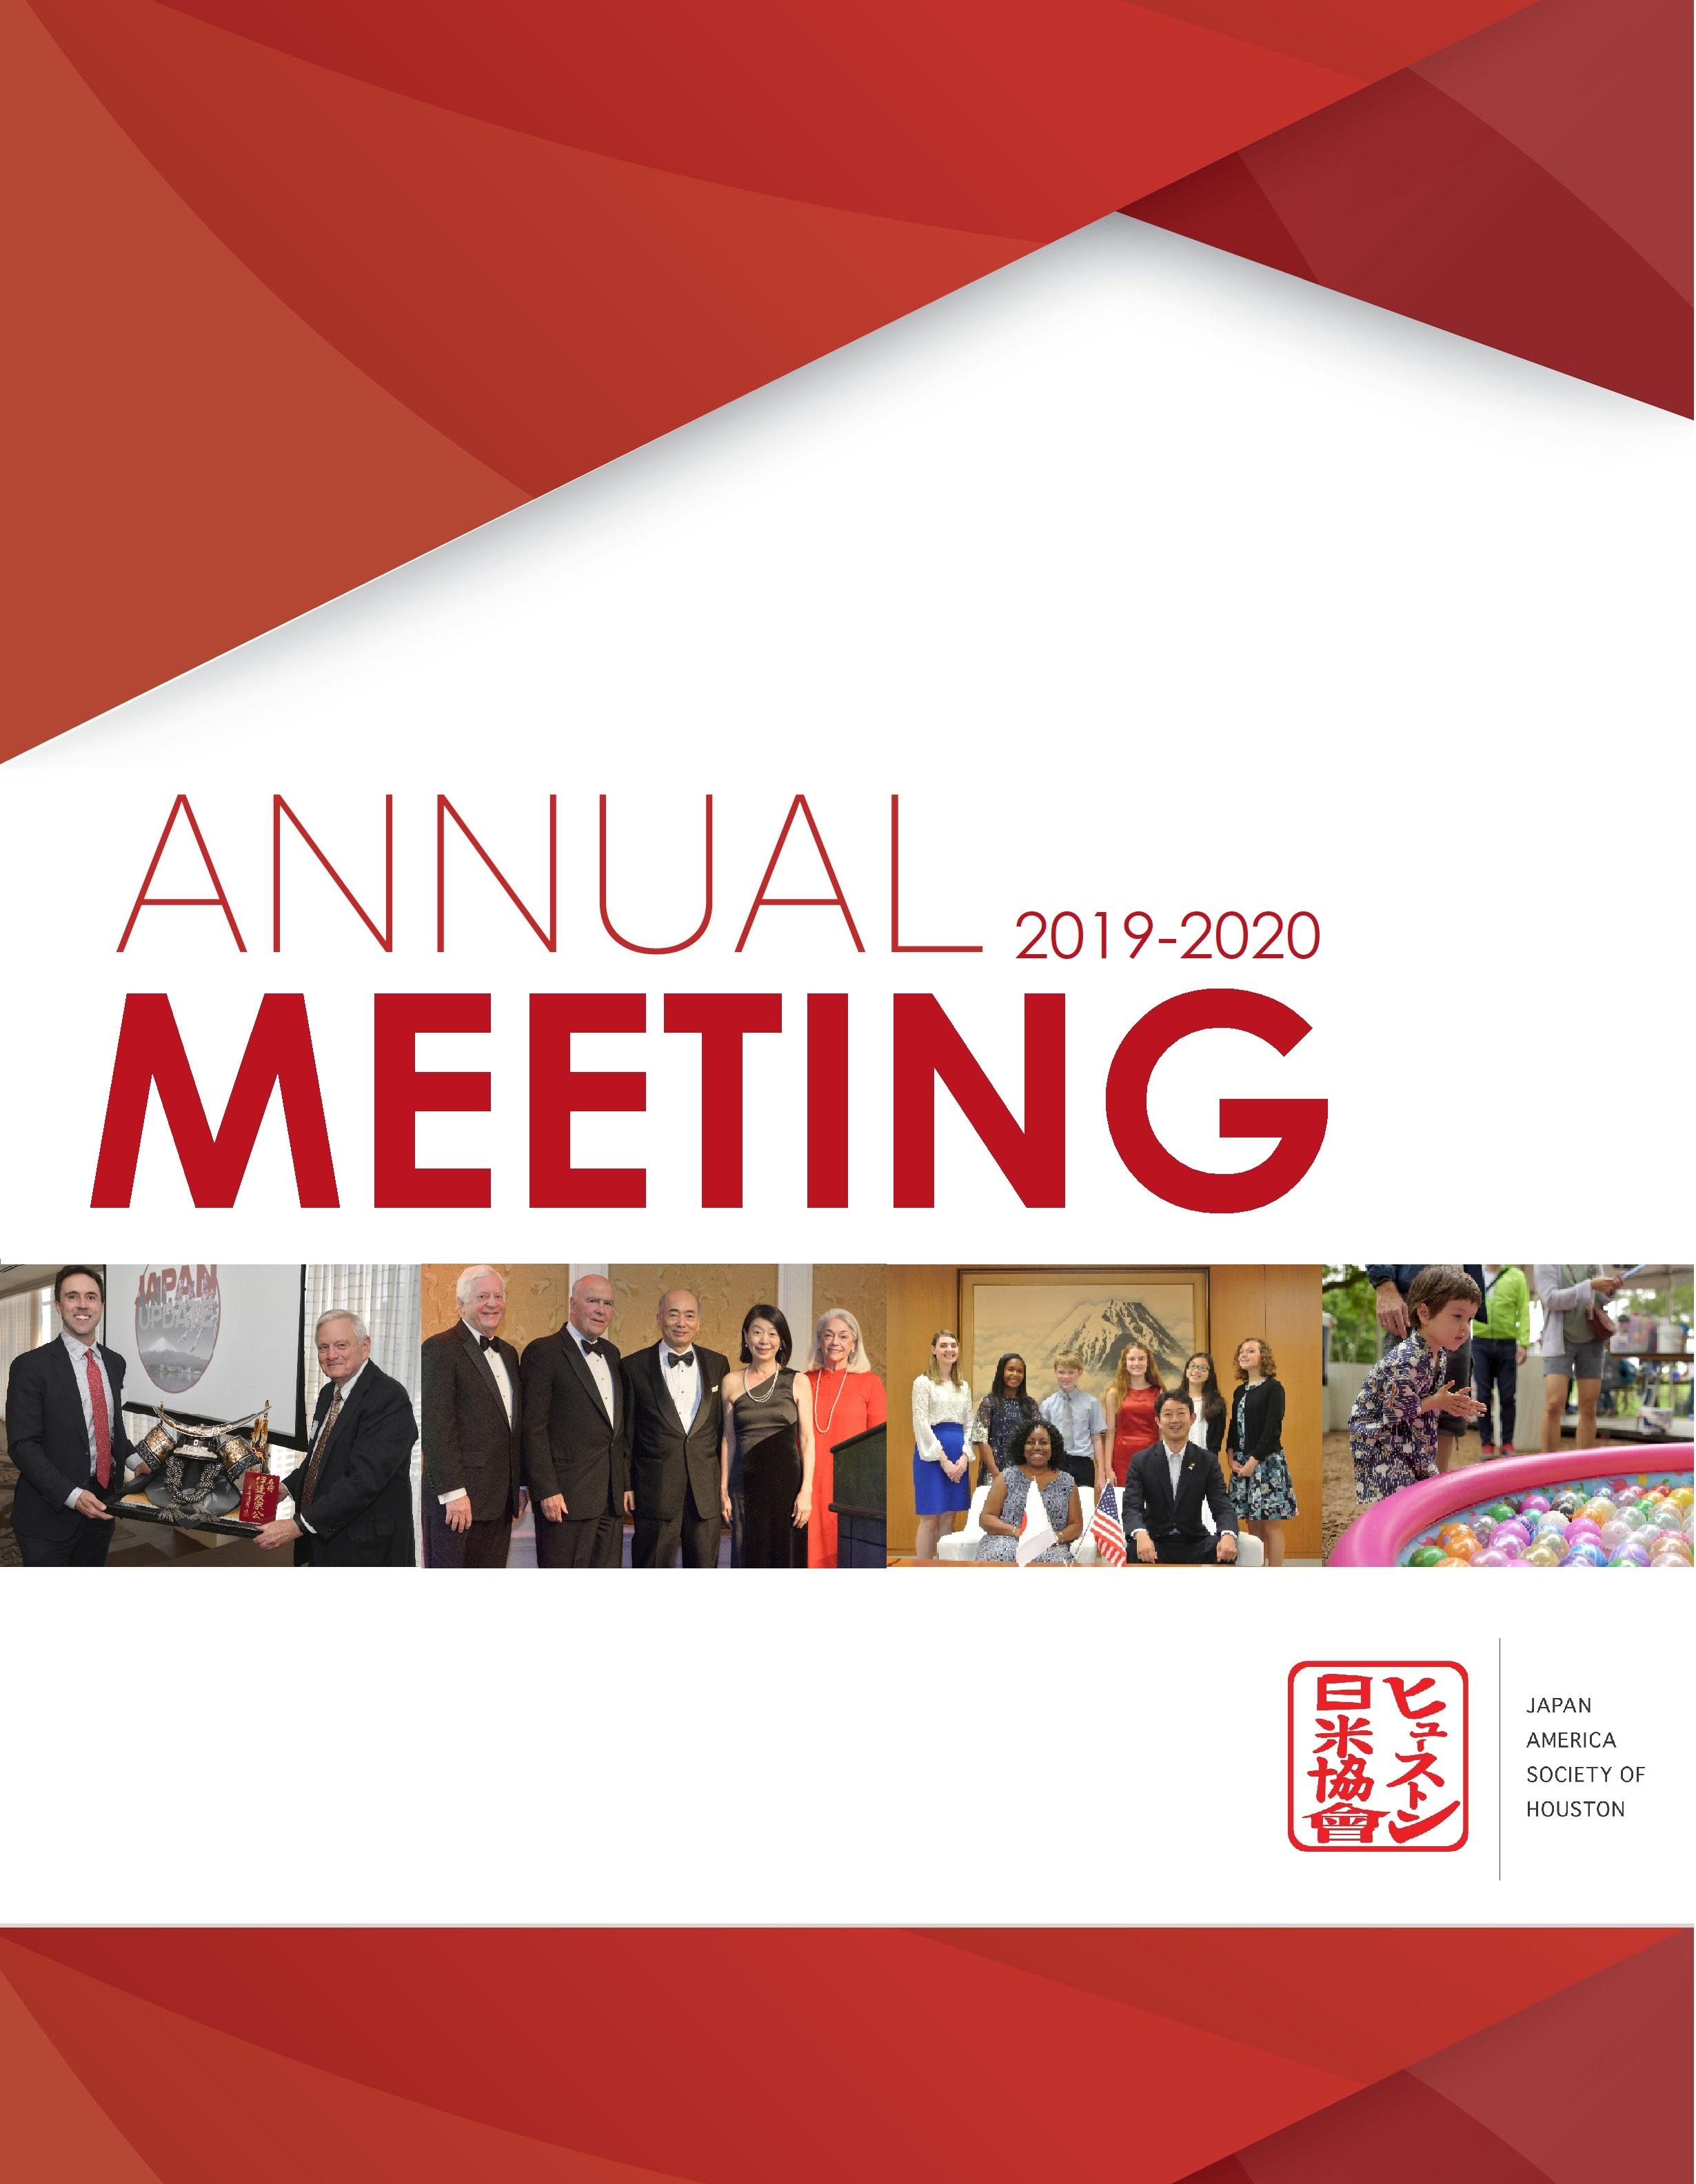 Annual Meeting 2019-2020_2.jpg